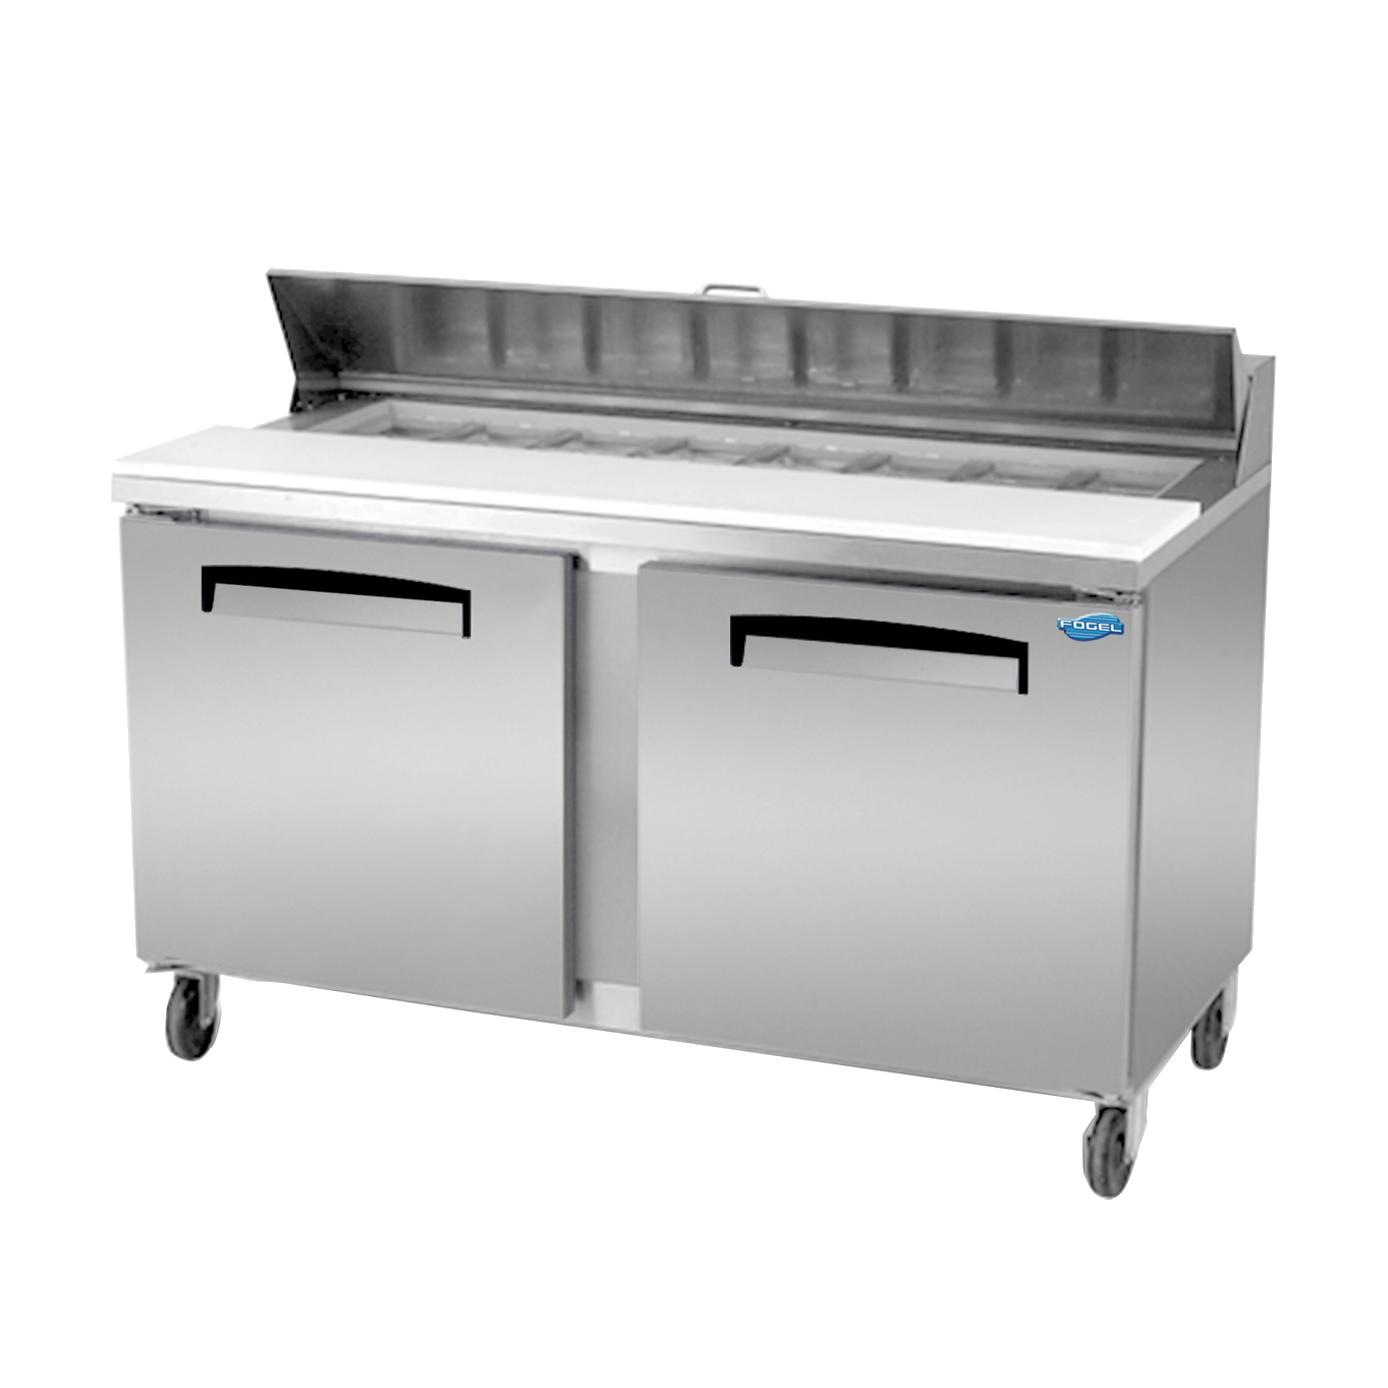 Fogel USA FLP-59-16 refrigerated counter, sandwich / salad unit